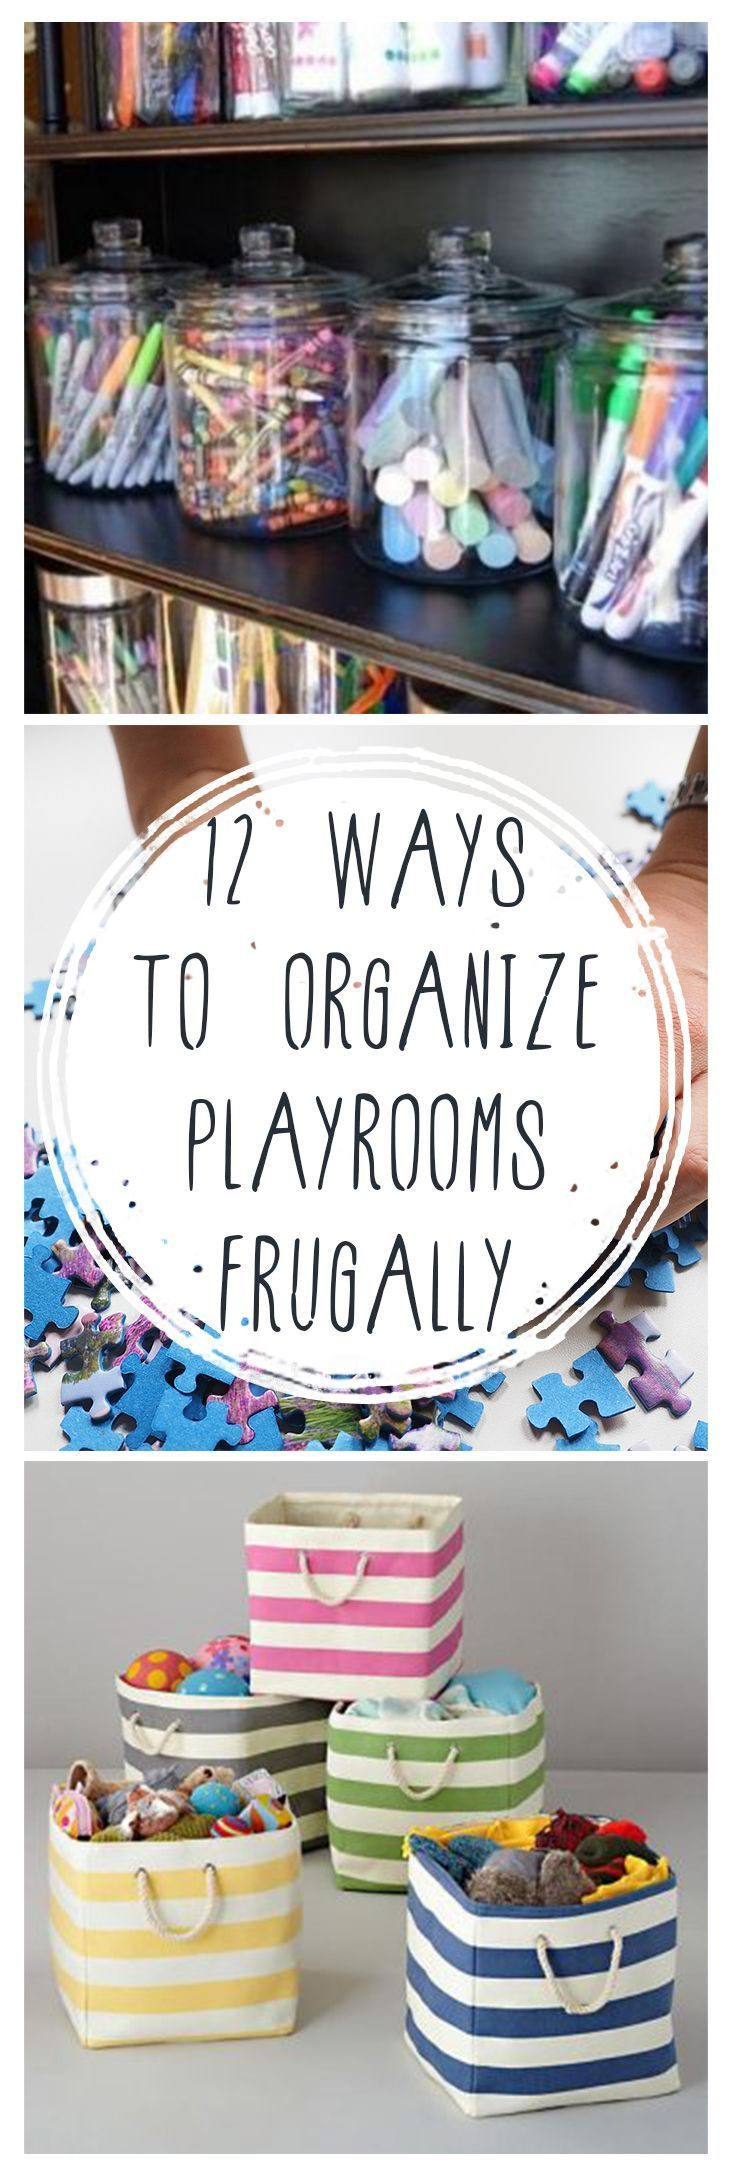 Playroom organization, organizing playrooms, how to organize playrooms, popular pin, DIY playroom organization, playroom storage.